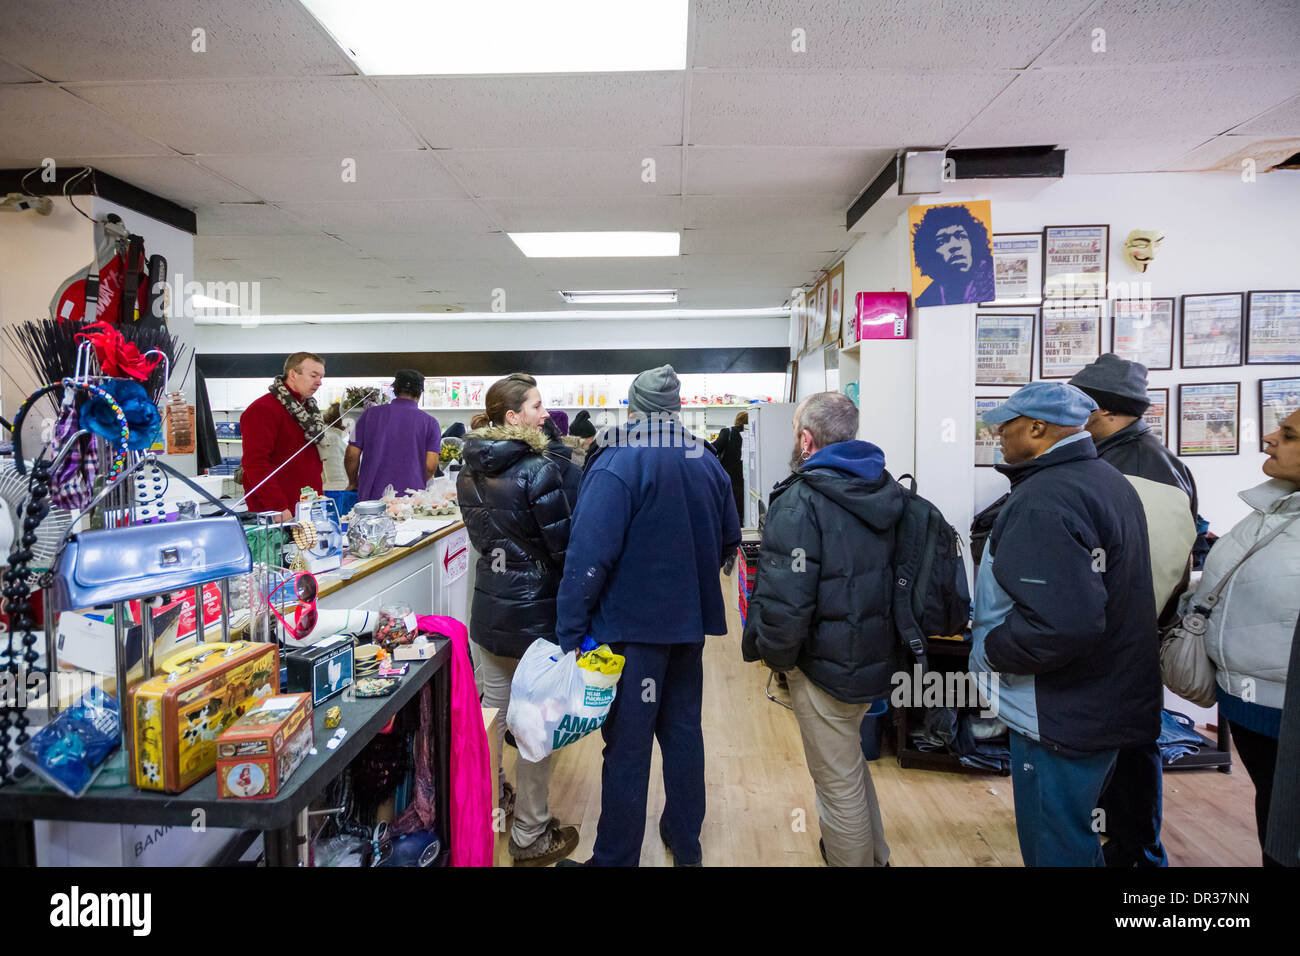 The Lewisham Food Bank in New Cross, London, UK. - Stock Image